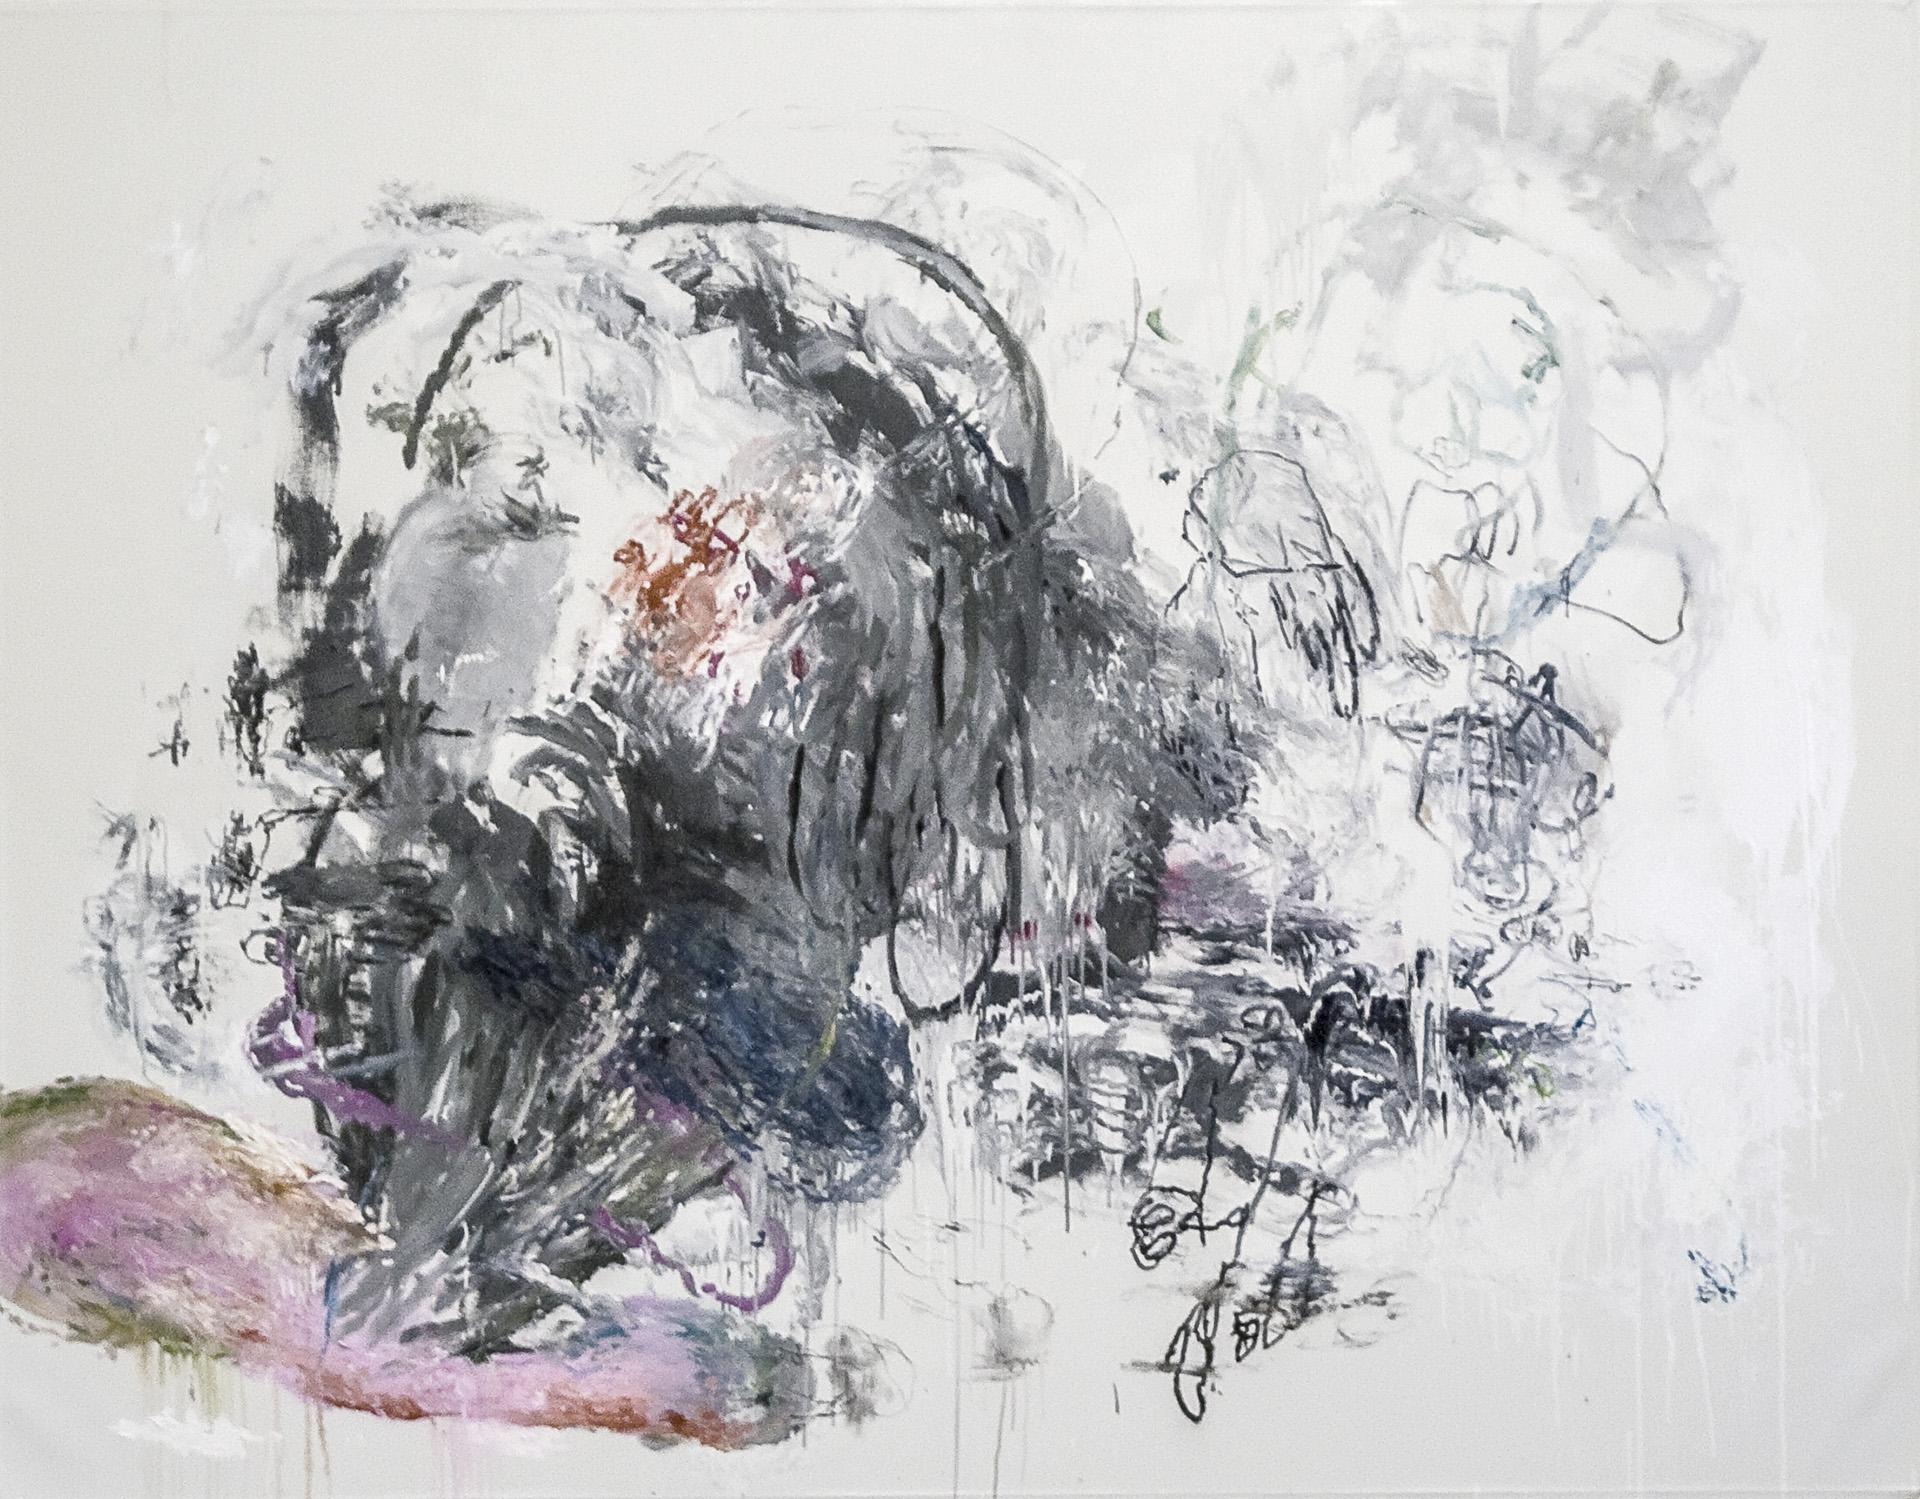 Tim Hussey, Bathos 1, oil, mixed media on canvas